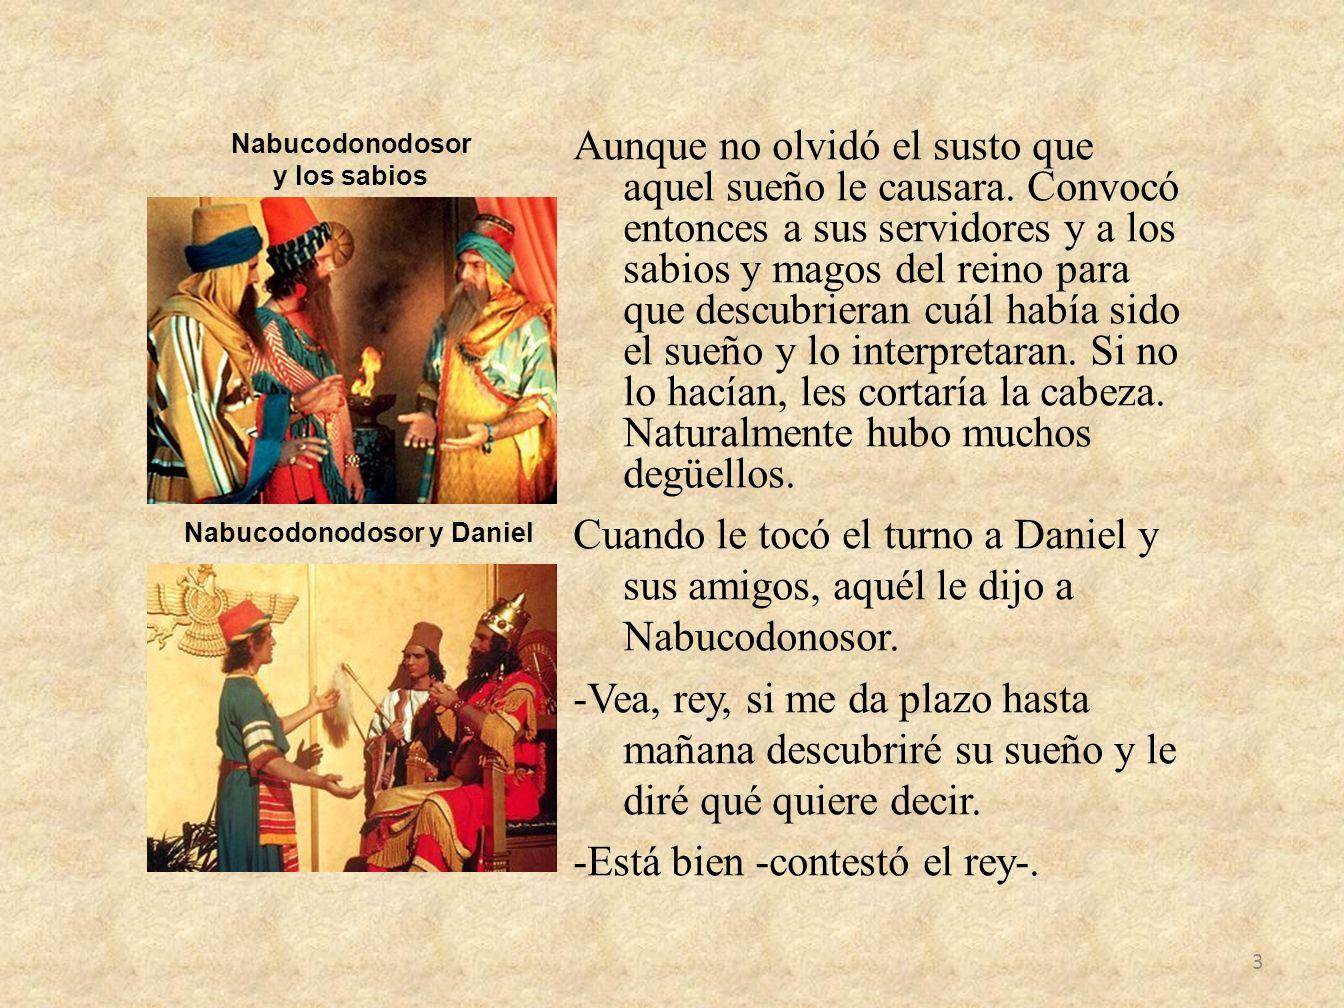 Nabucodonodosor y Daniel